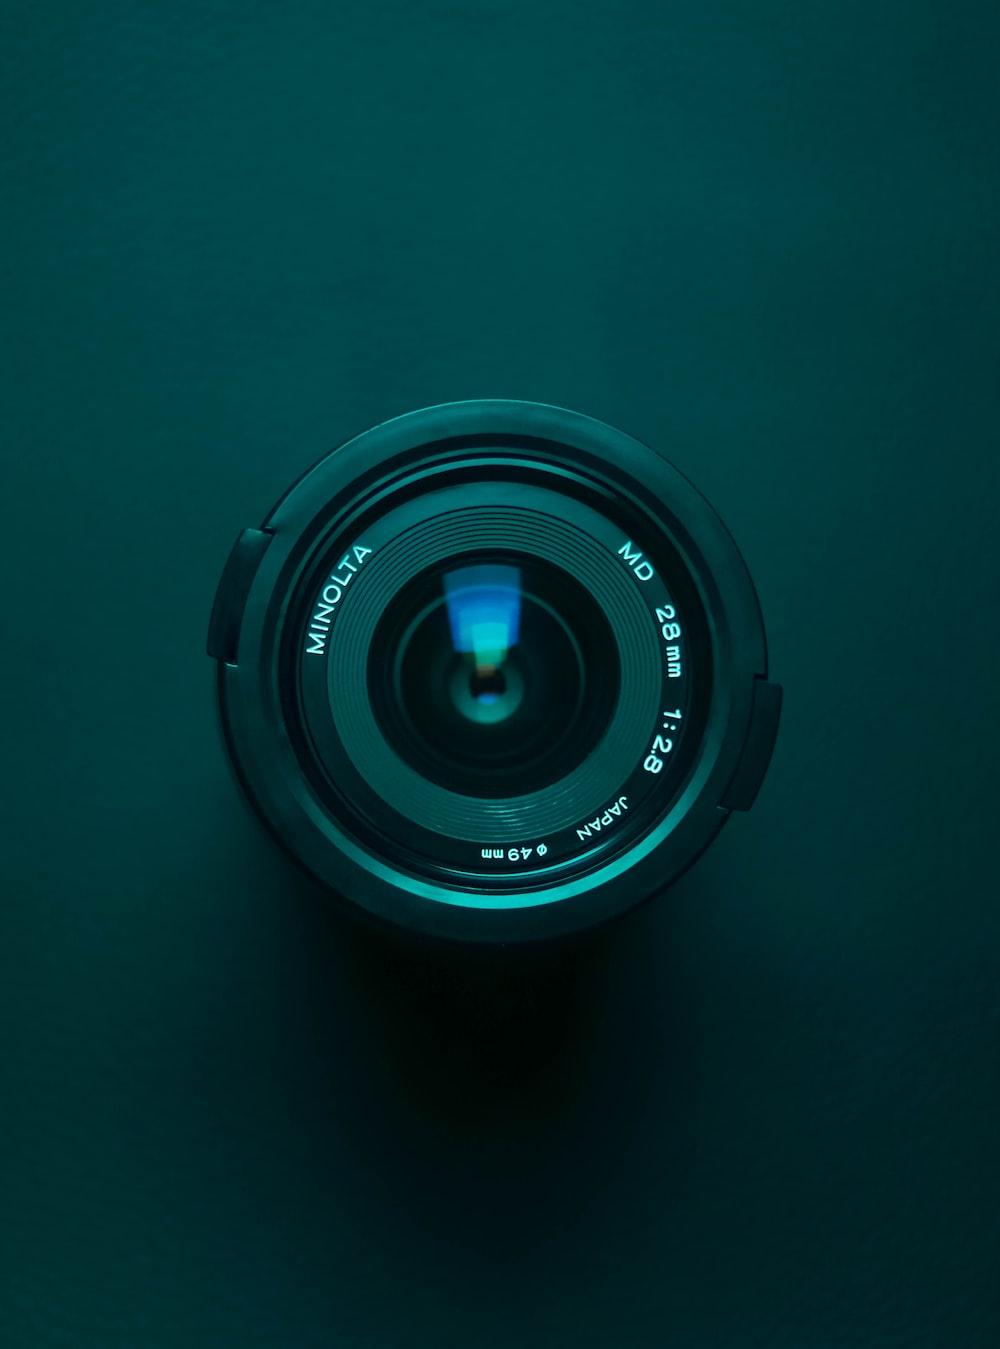 black camera lens on blue surface